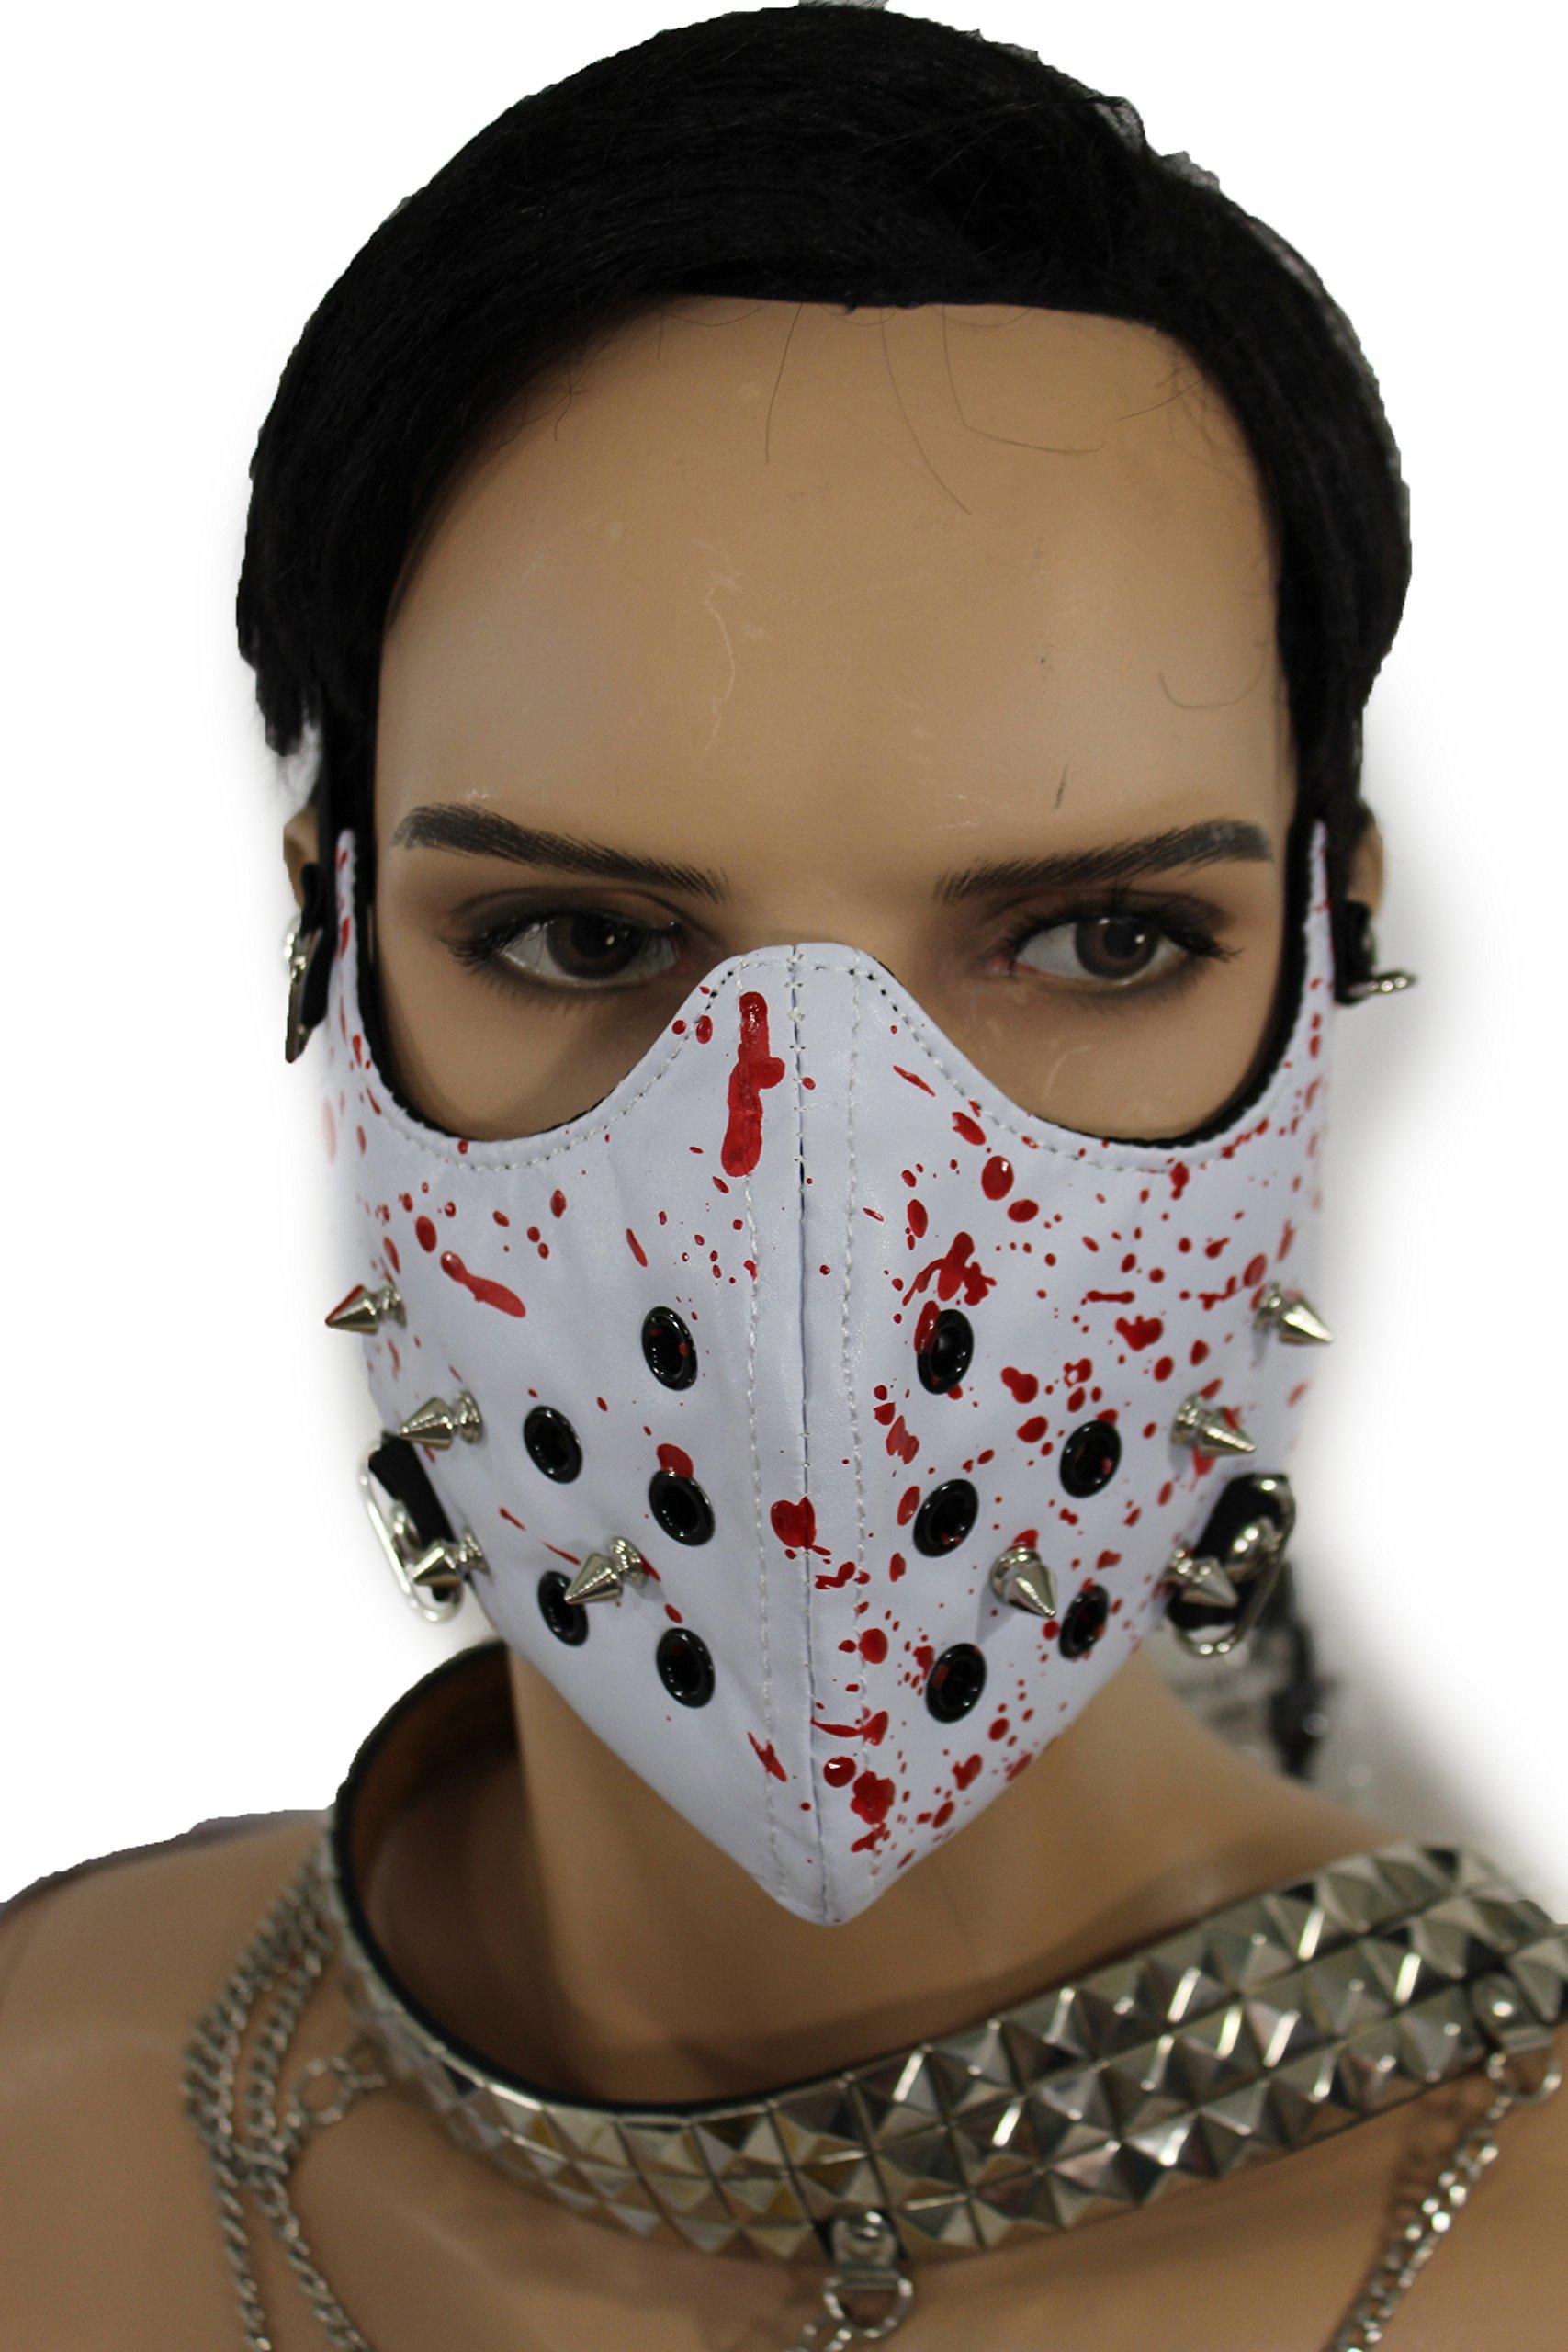 TFJ Men Mouth Muzzel Halloween Half Face Hannibal Spikes Mask S&m Costume Blood White